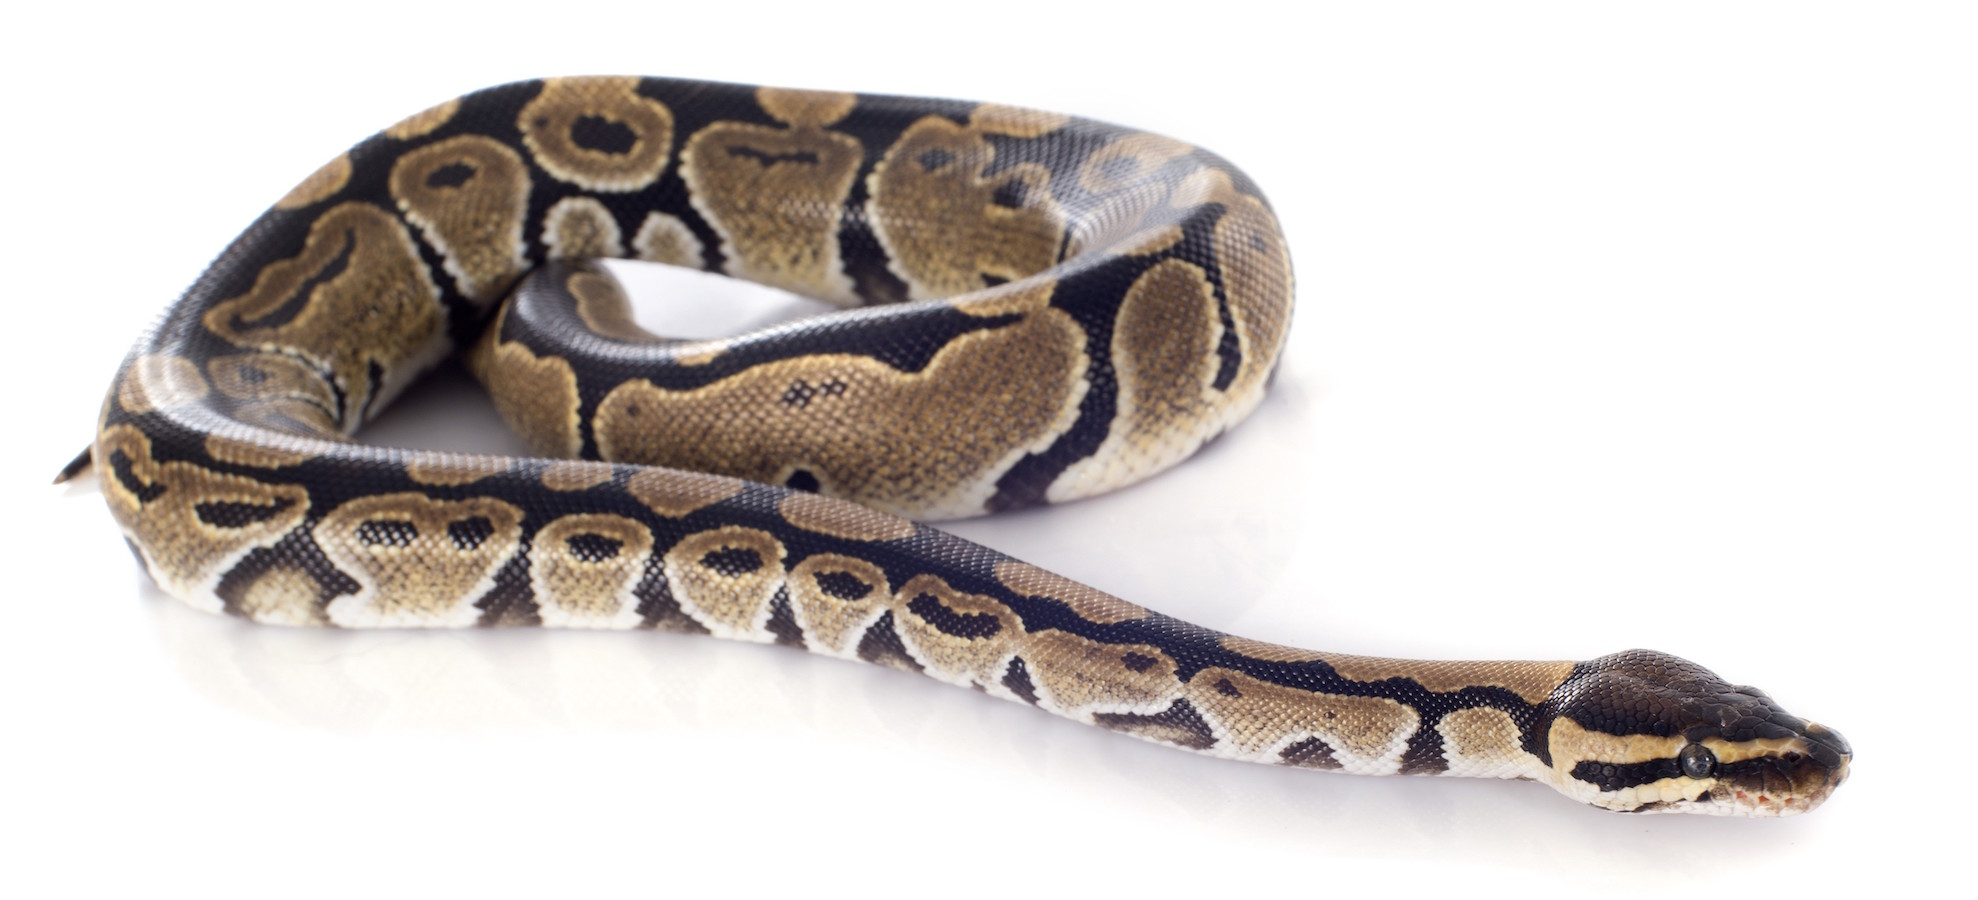 Python regius in front of white background